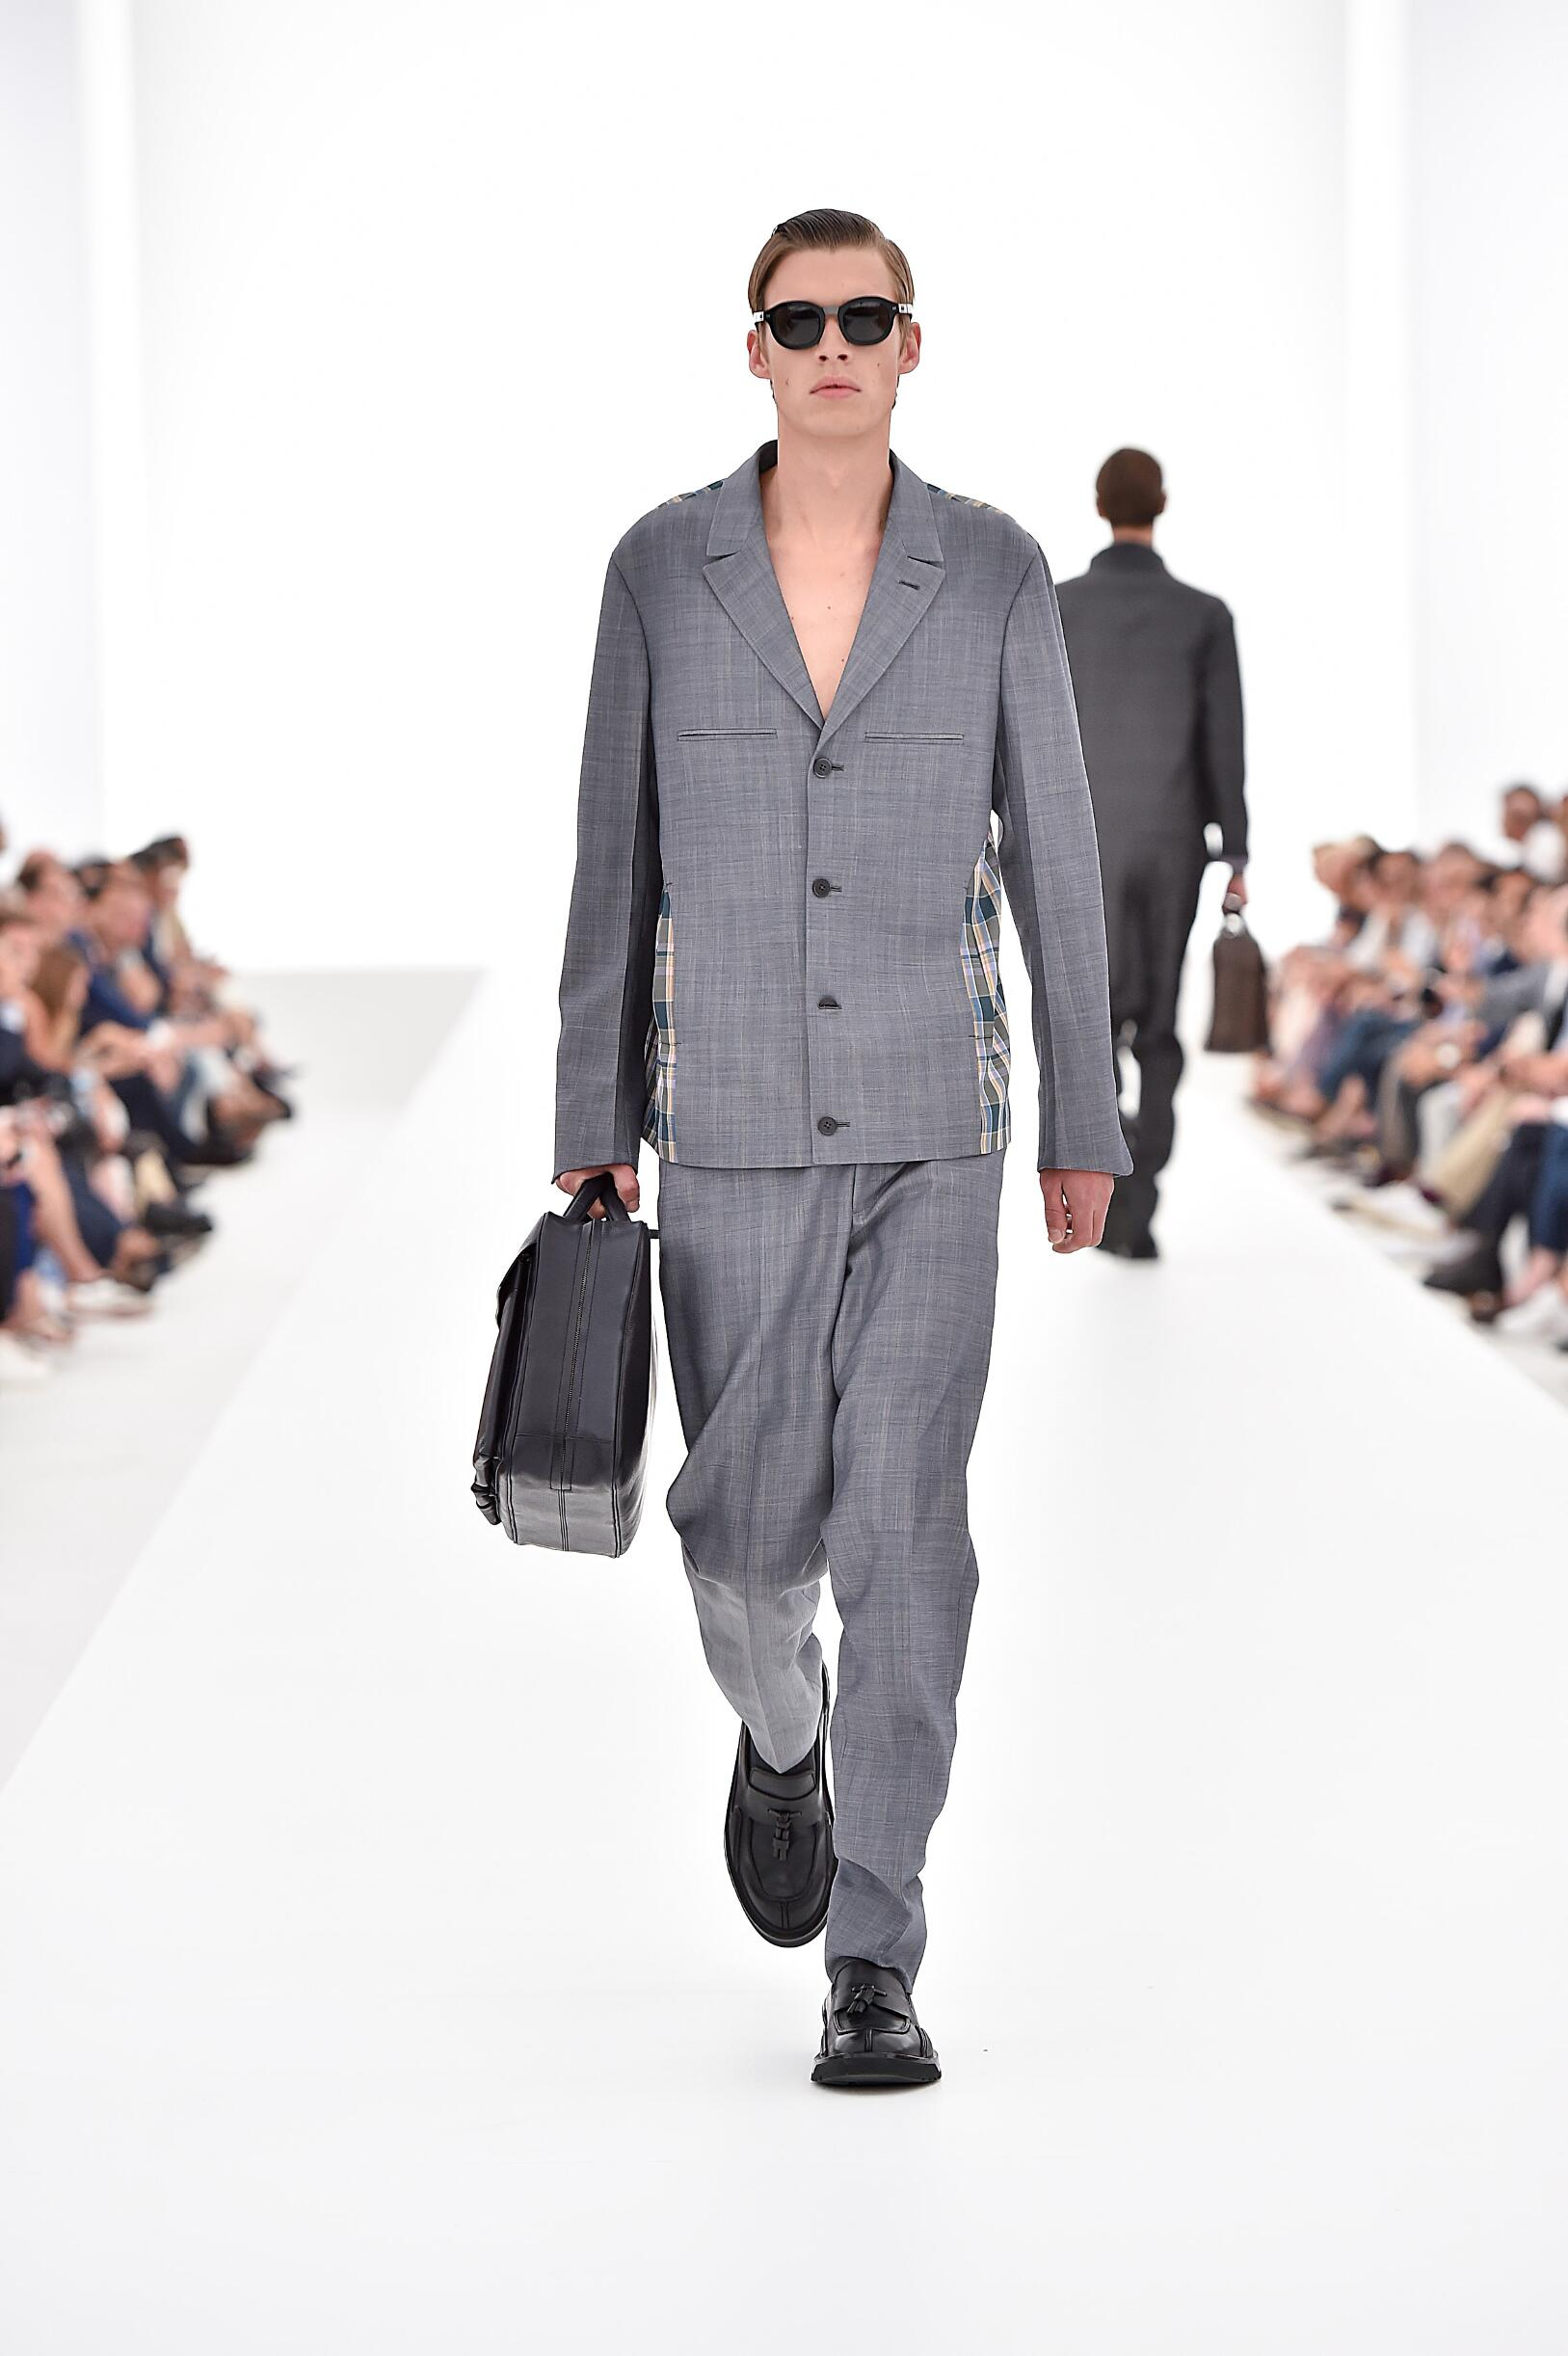 Fashion Menswear Ermenegildo Zegna Couture Collection Catwalk